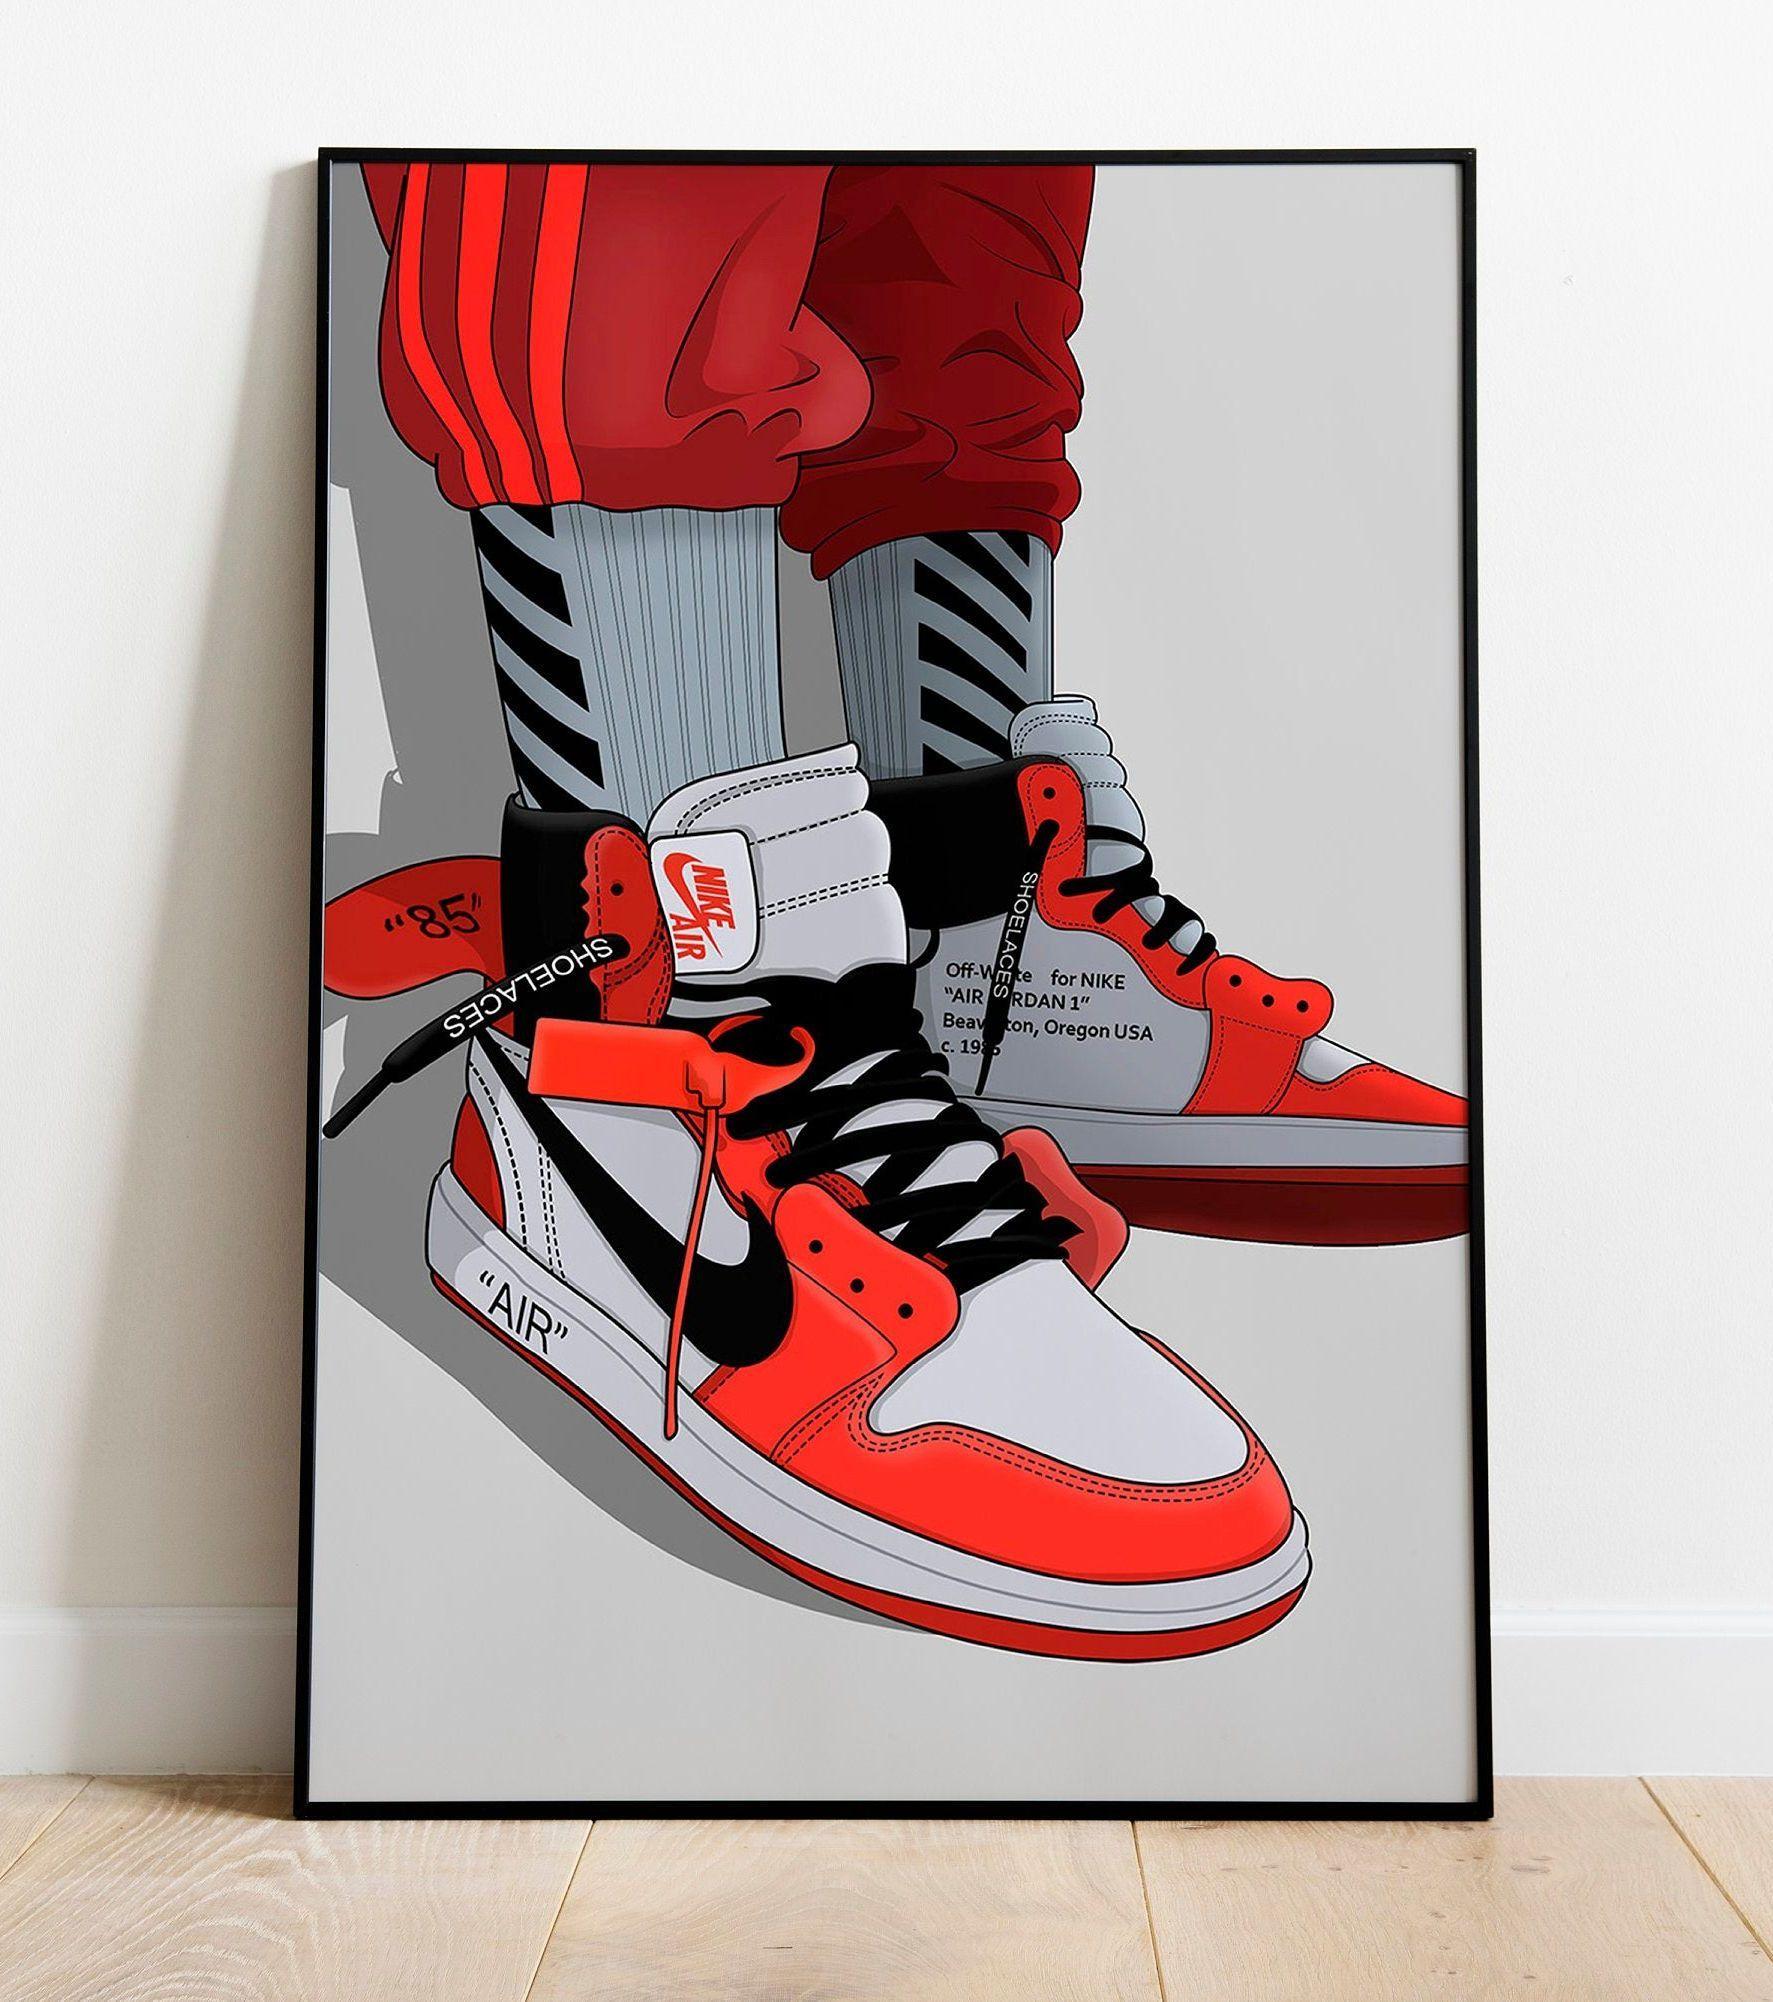 Jordan 1, Off White Wall Art, Hypebeast Poster | Sneaker posters ...